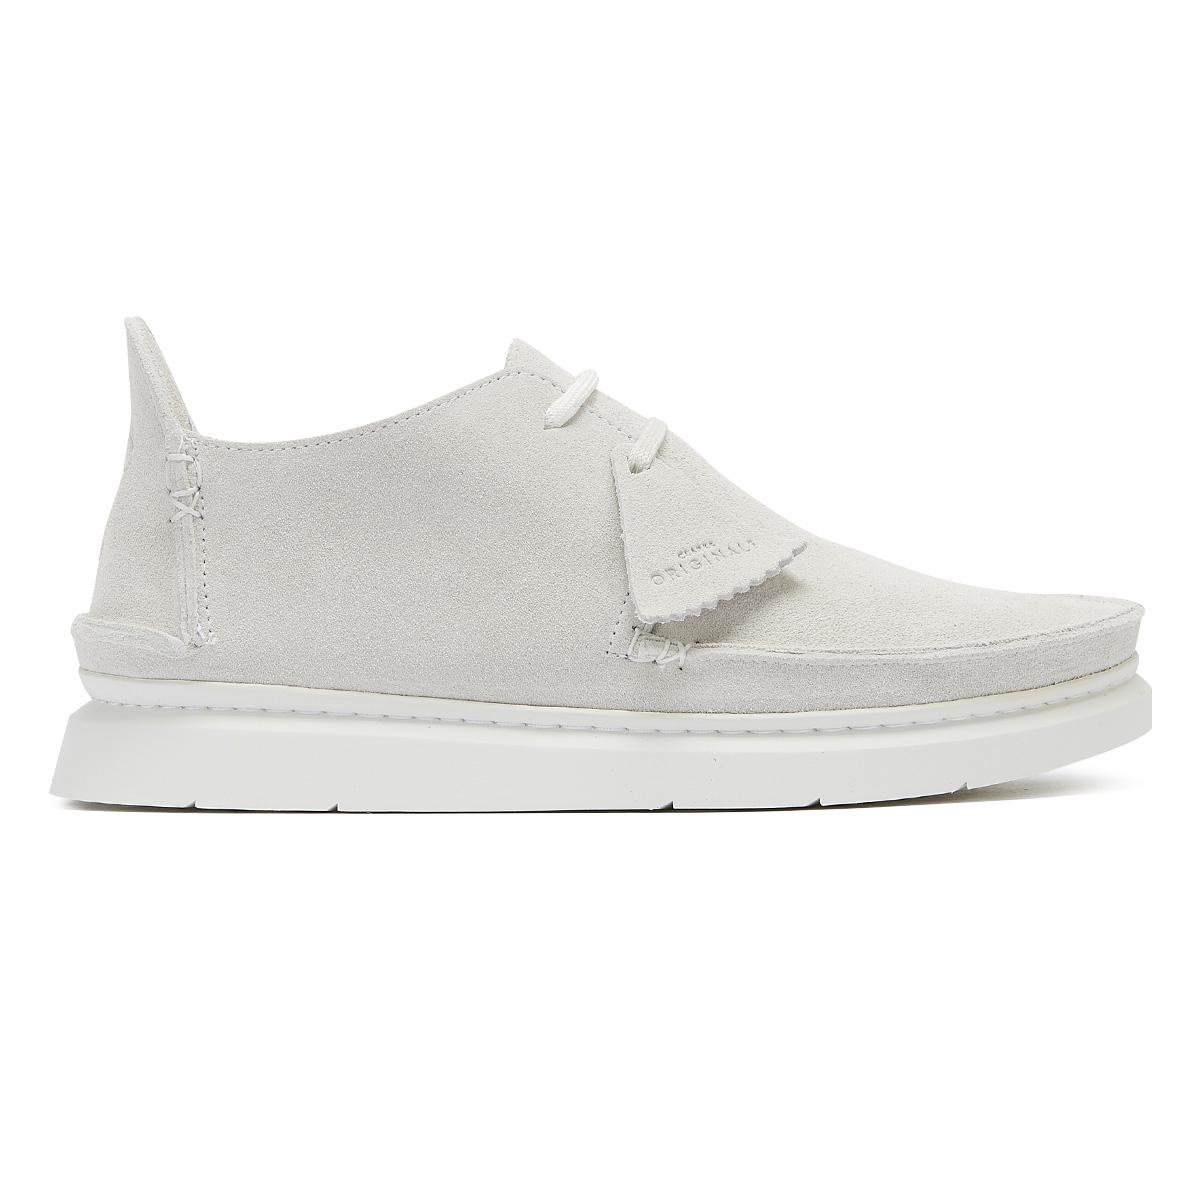 new arrival a599a 3cb41 Clarks Originals Seven Mens White Premium Suede Shoes Lace Up Casual